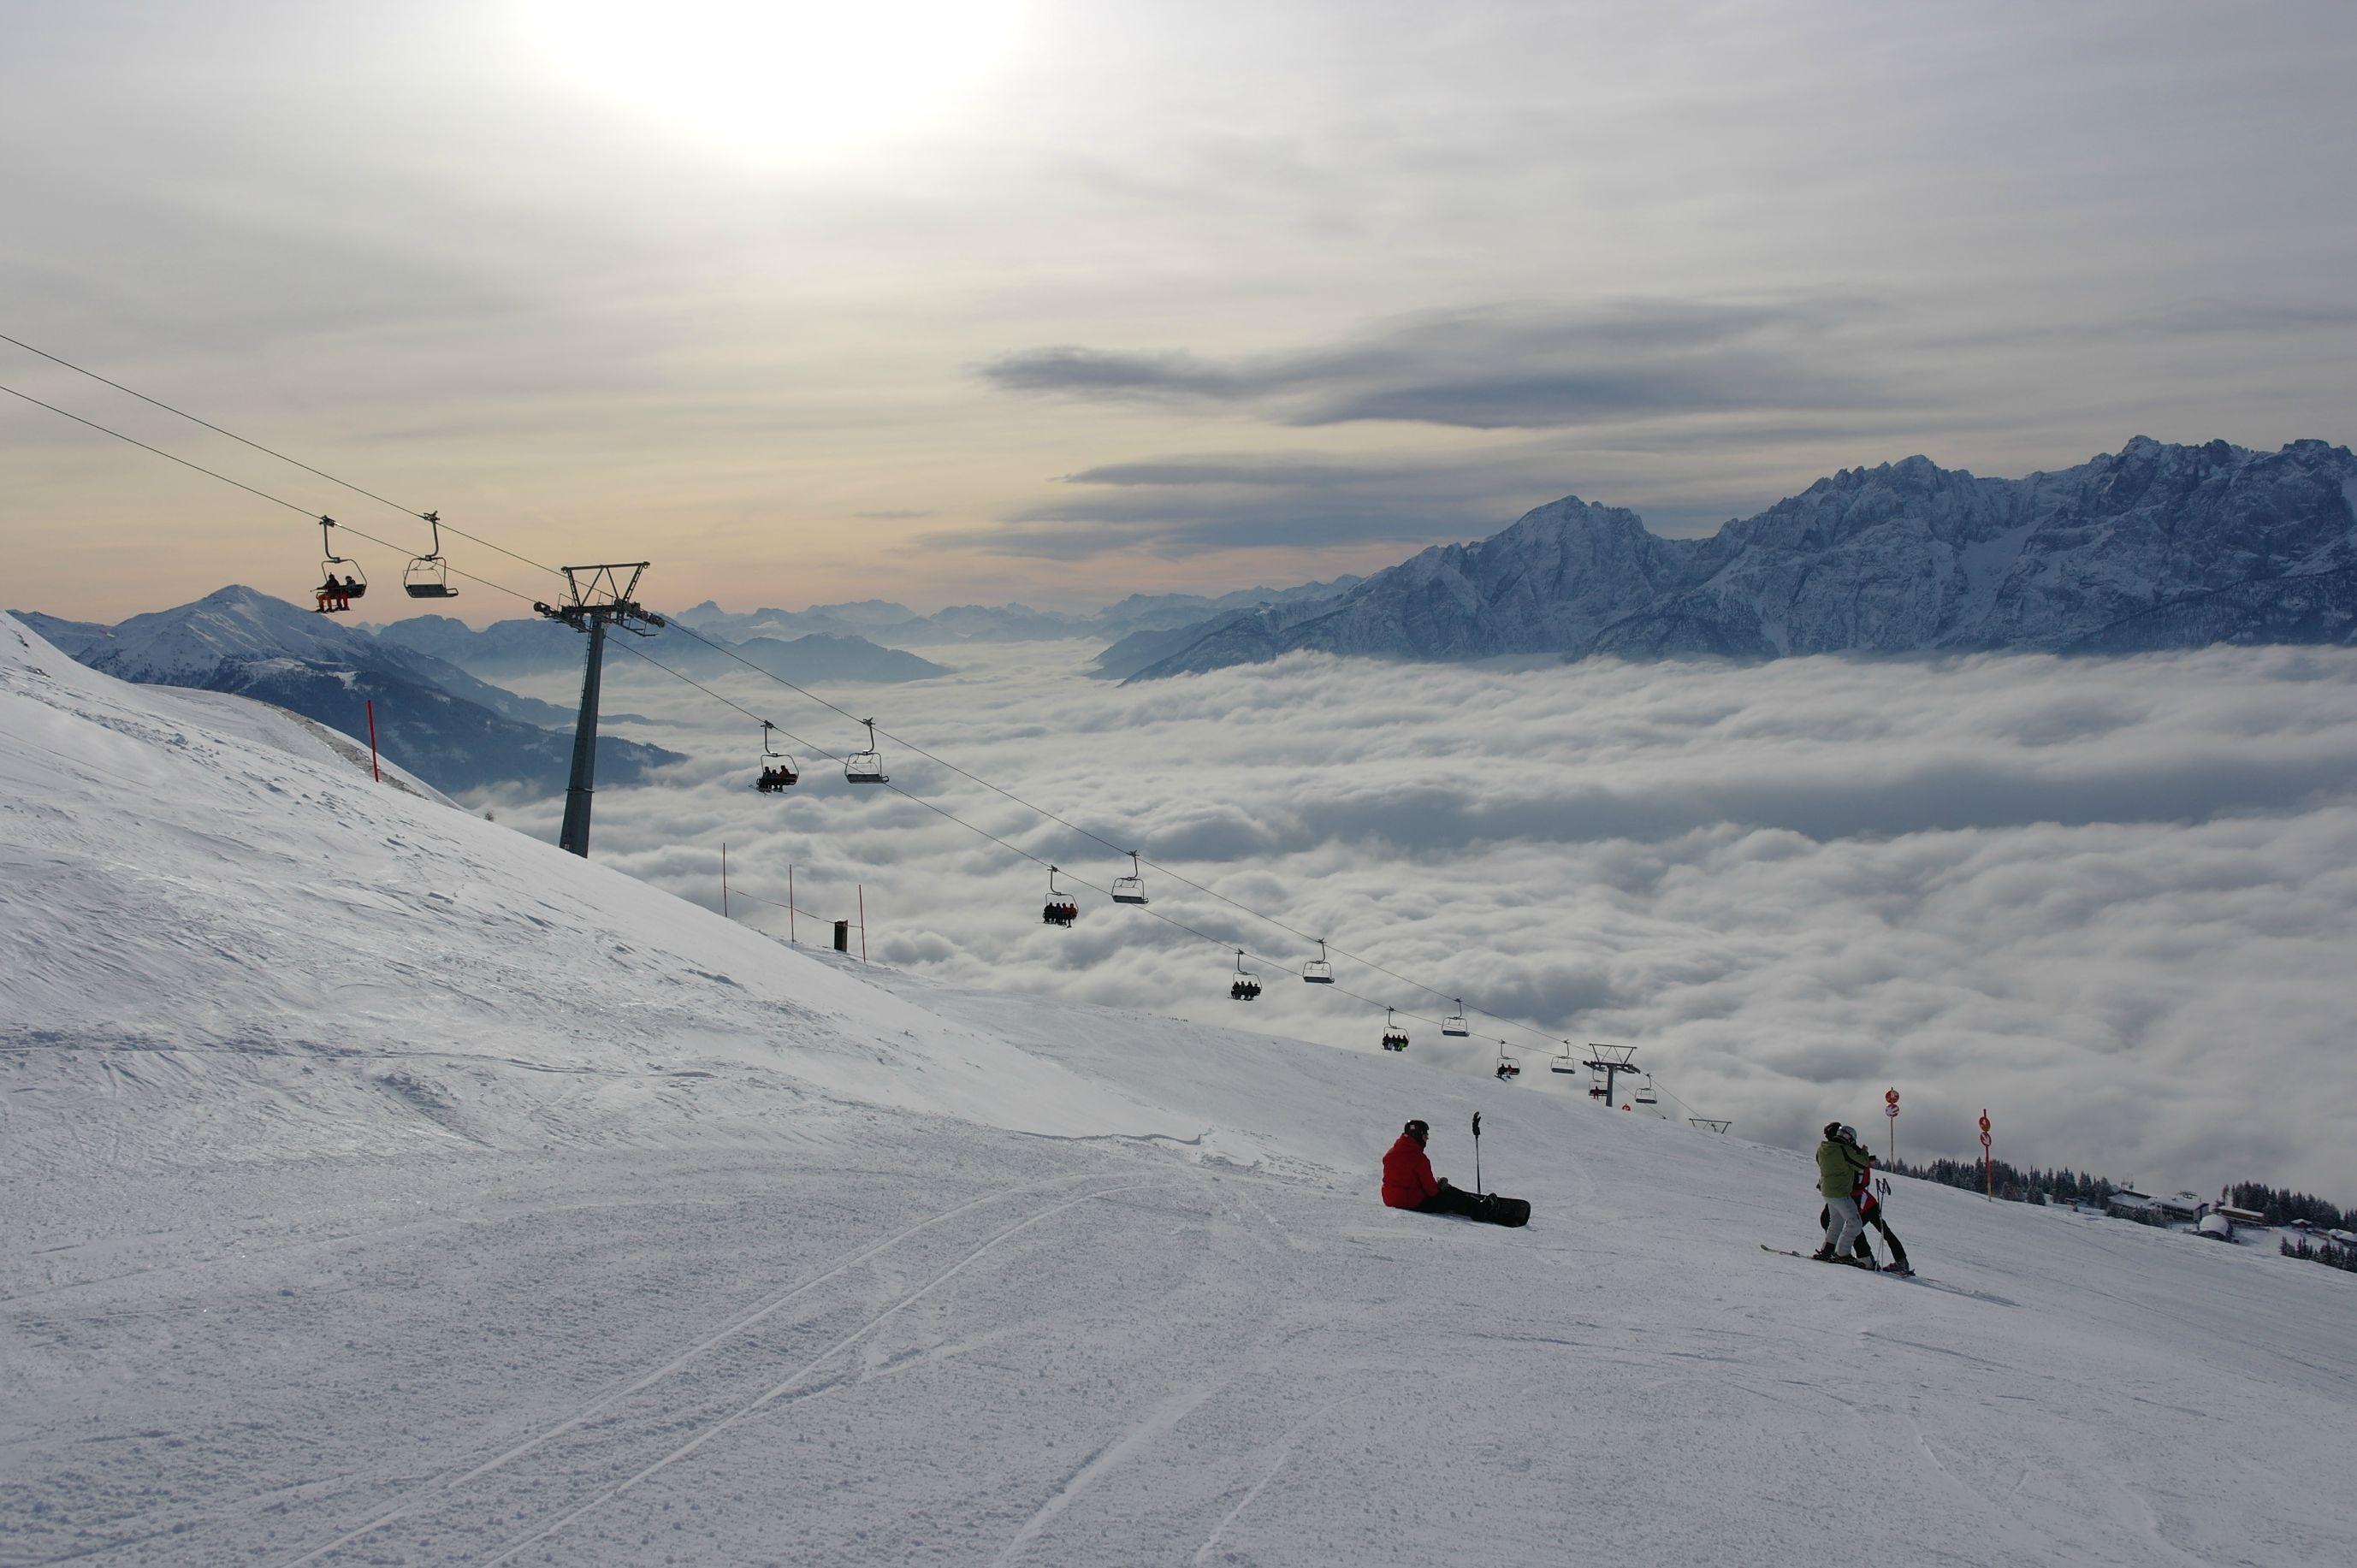 Fog over the city of Lienz, Austria